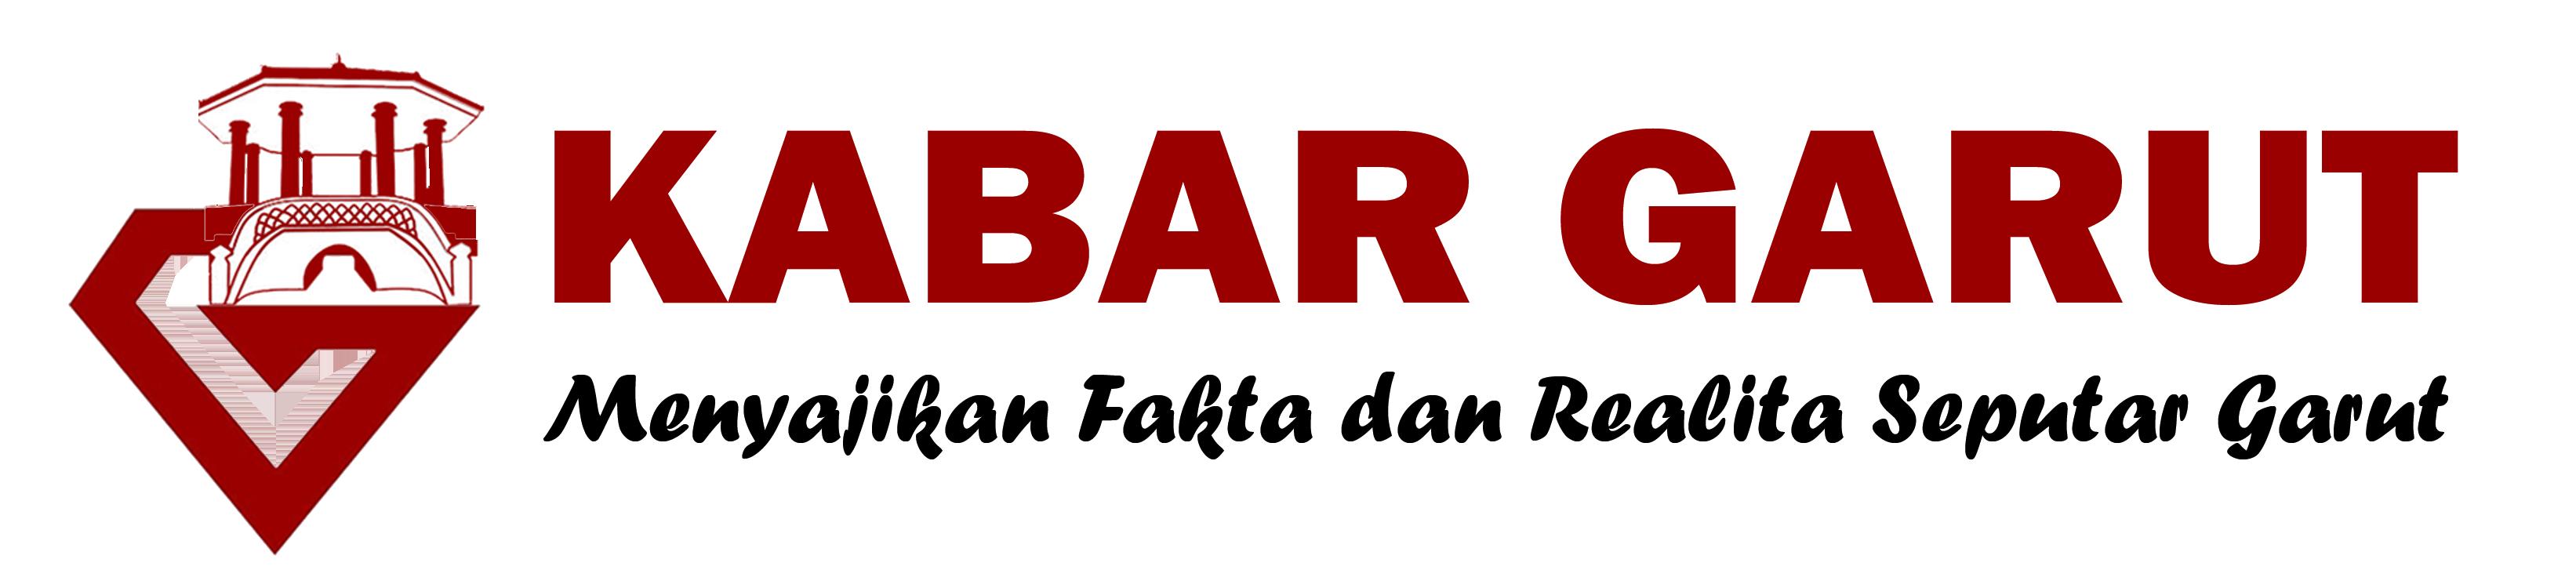 KABAR GARUT